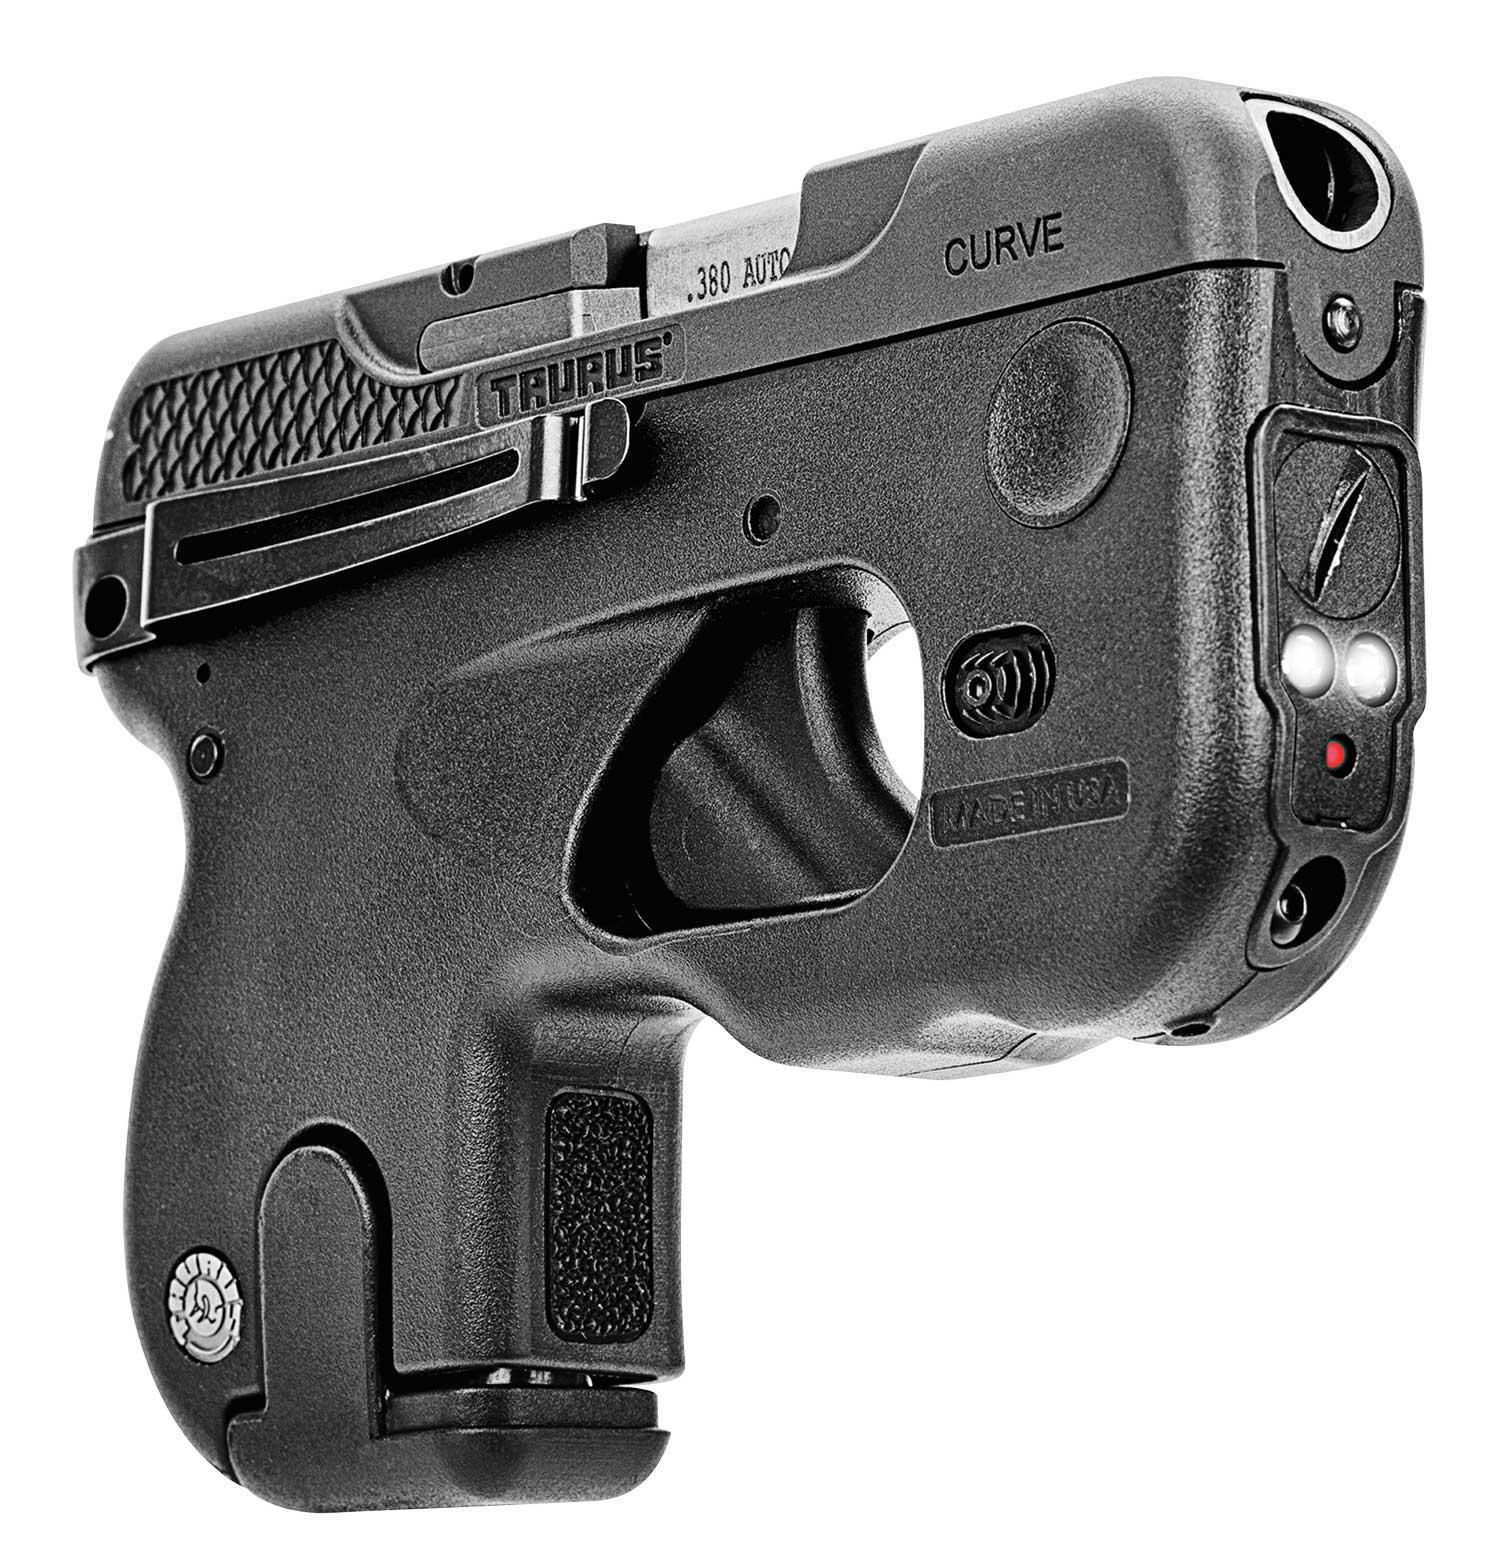 Taurus Curve pistol black